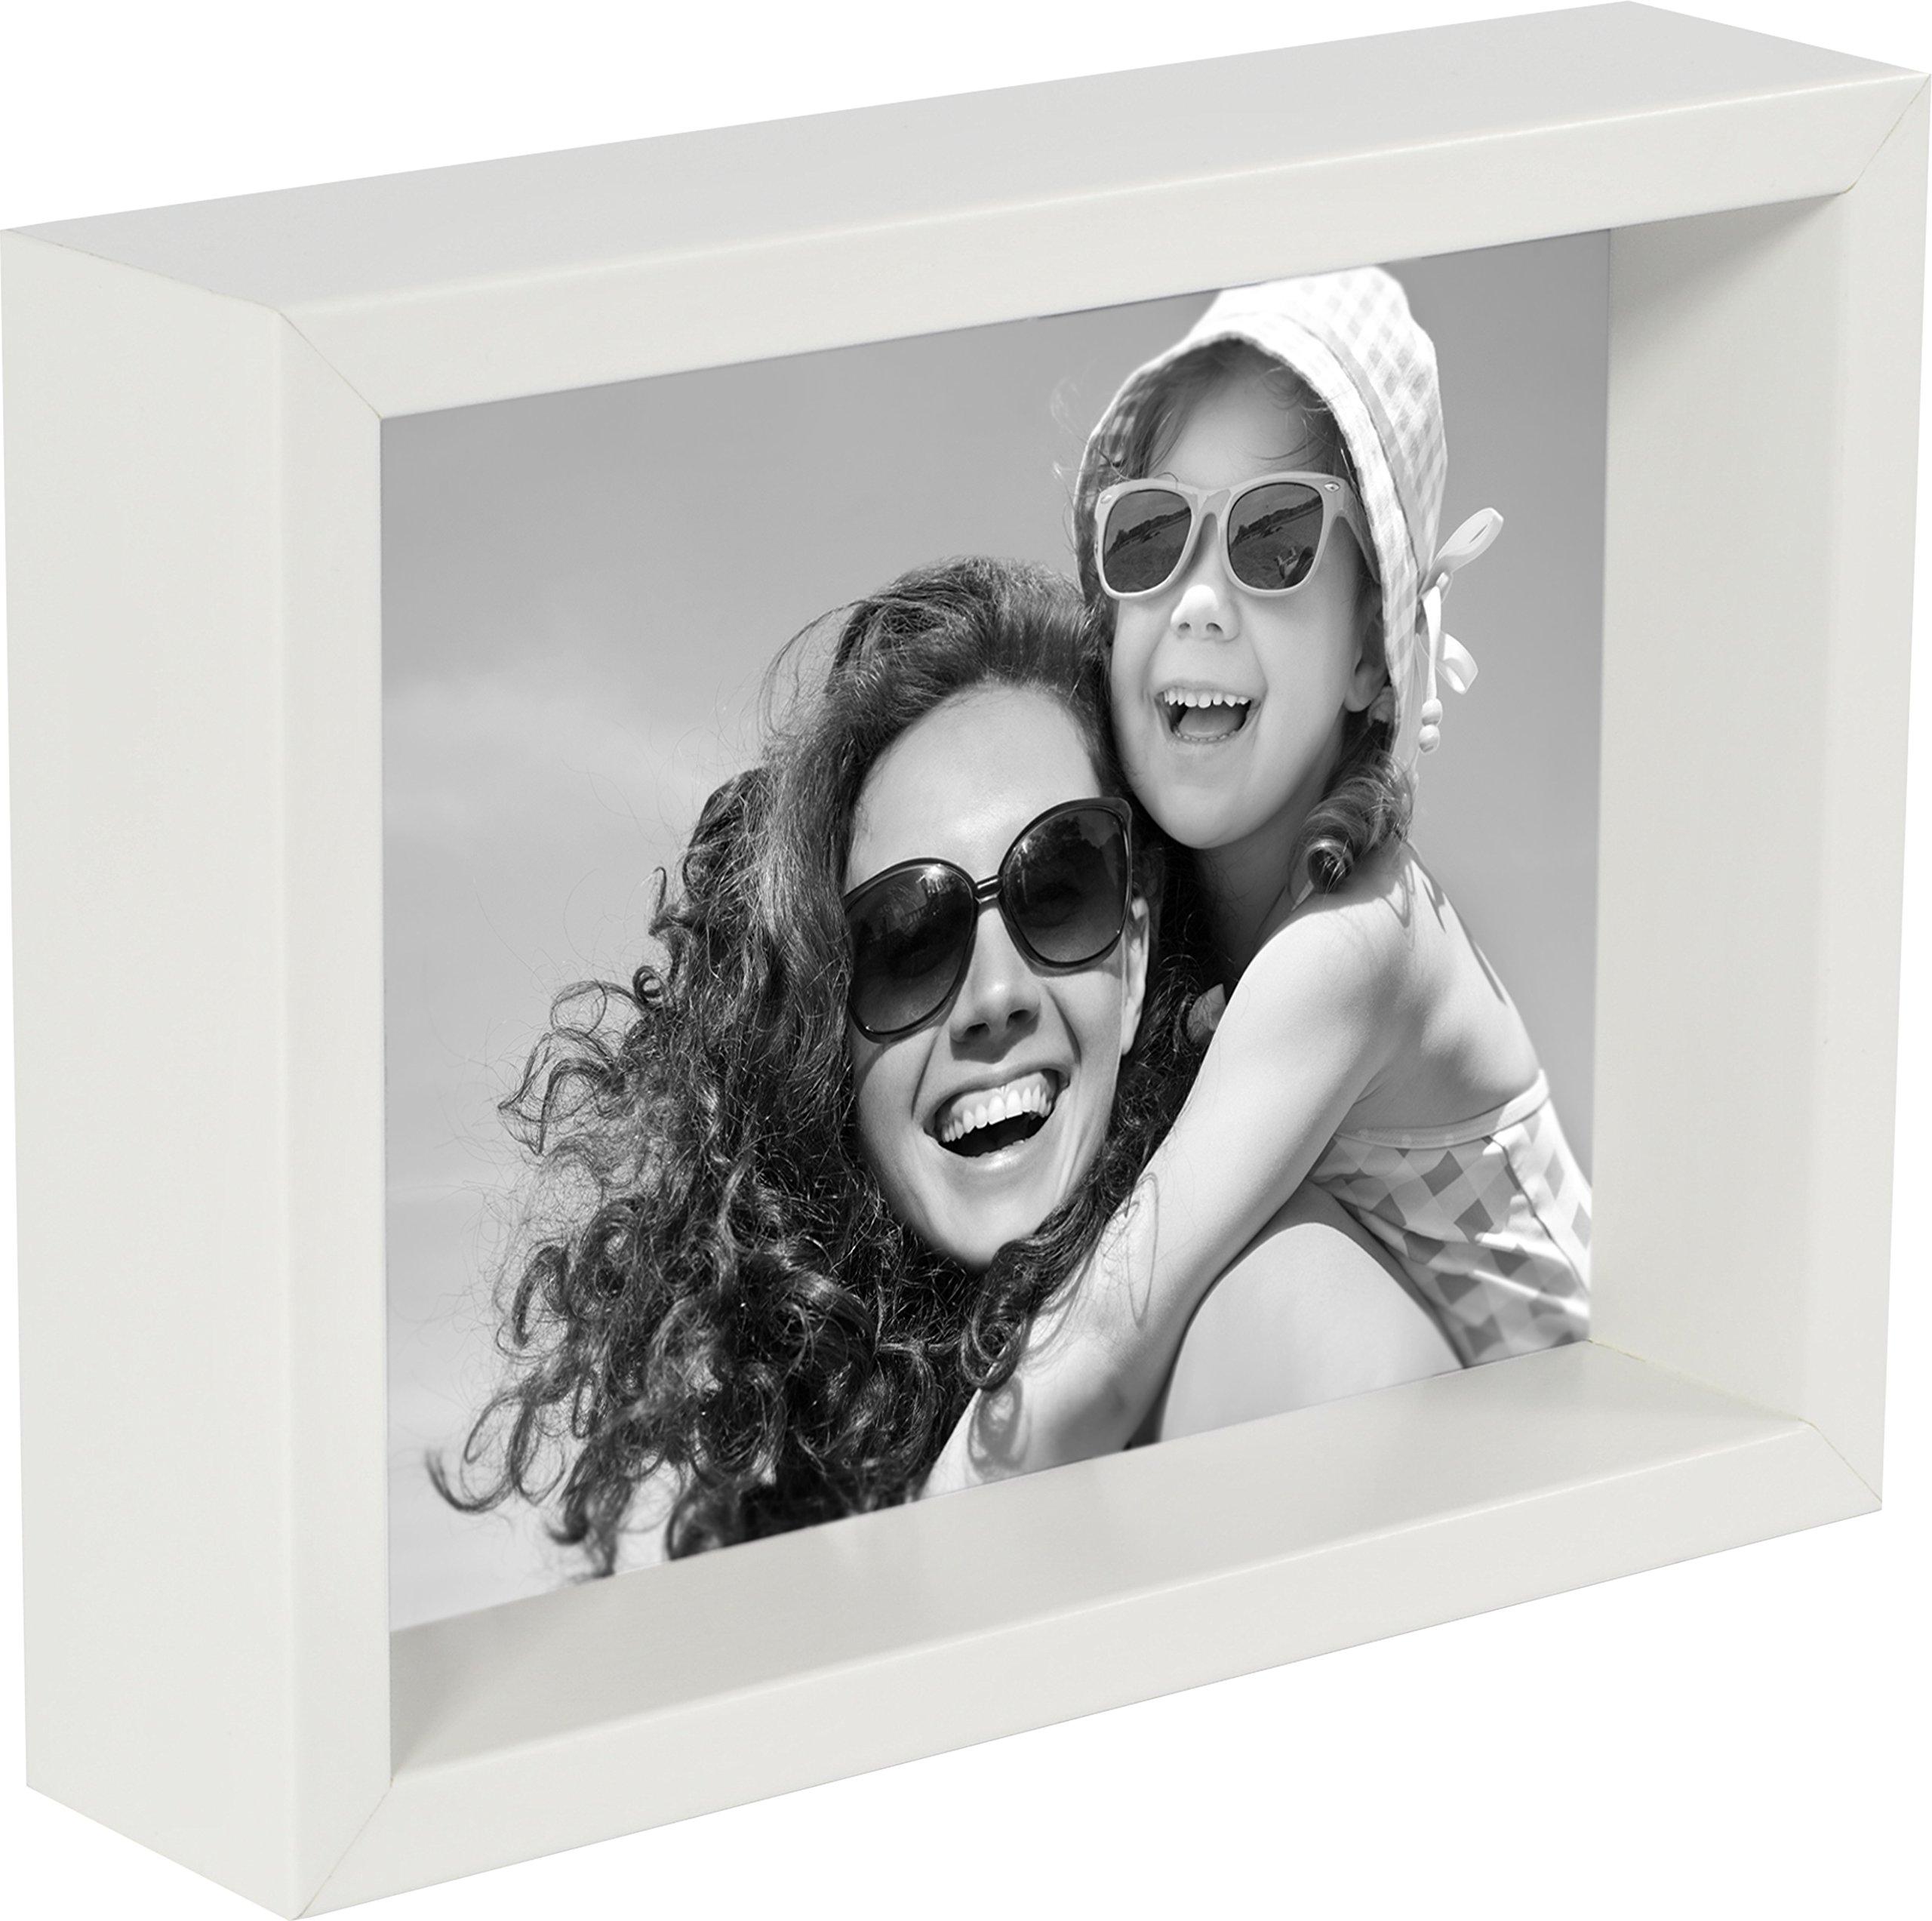 BD ART Cadre Photo Blanc 10 x 15 cm product image